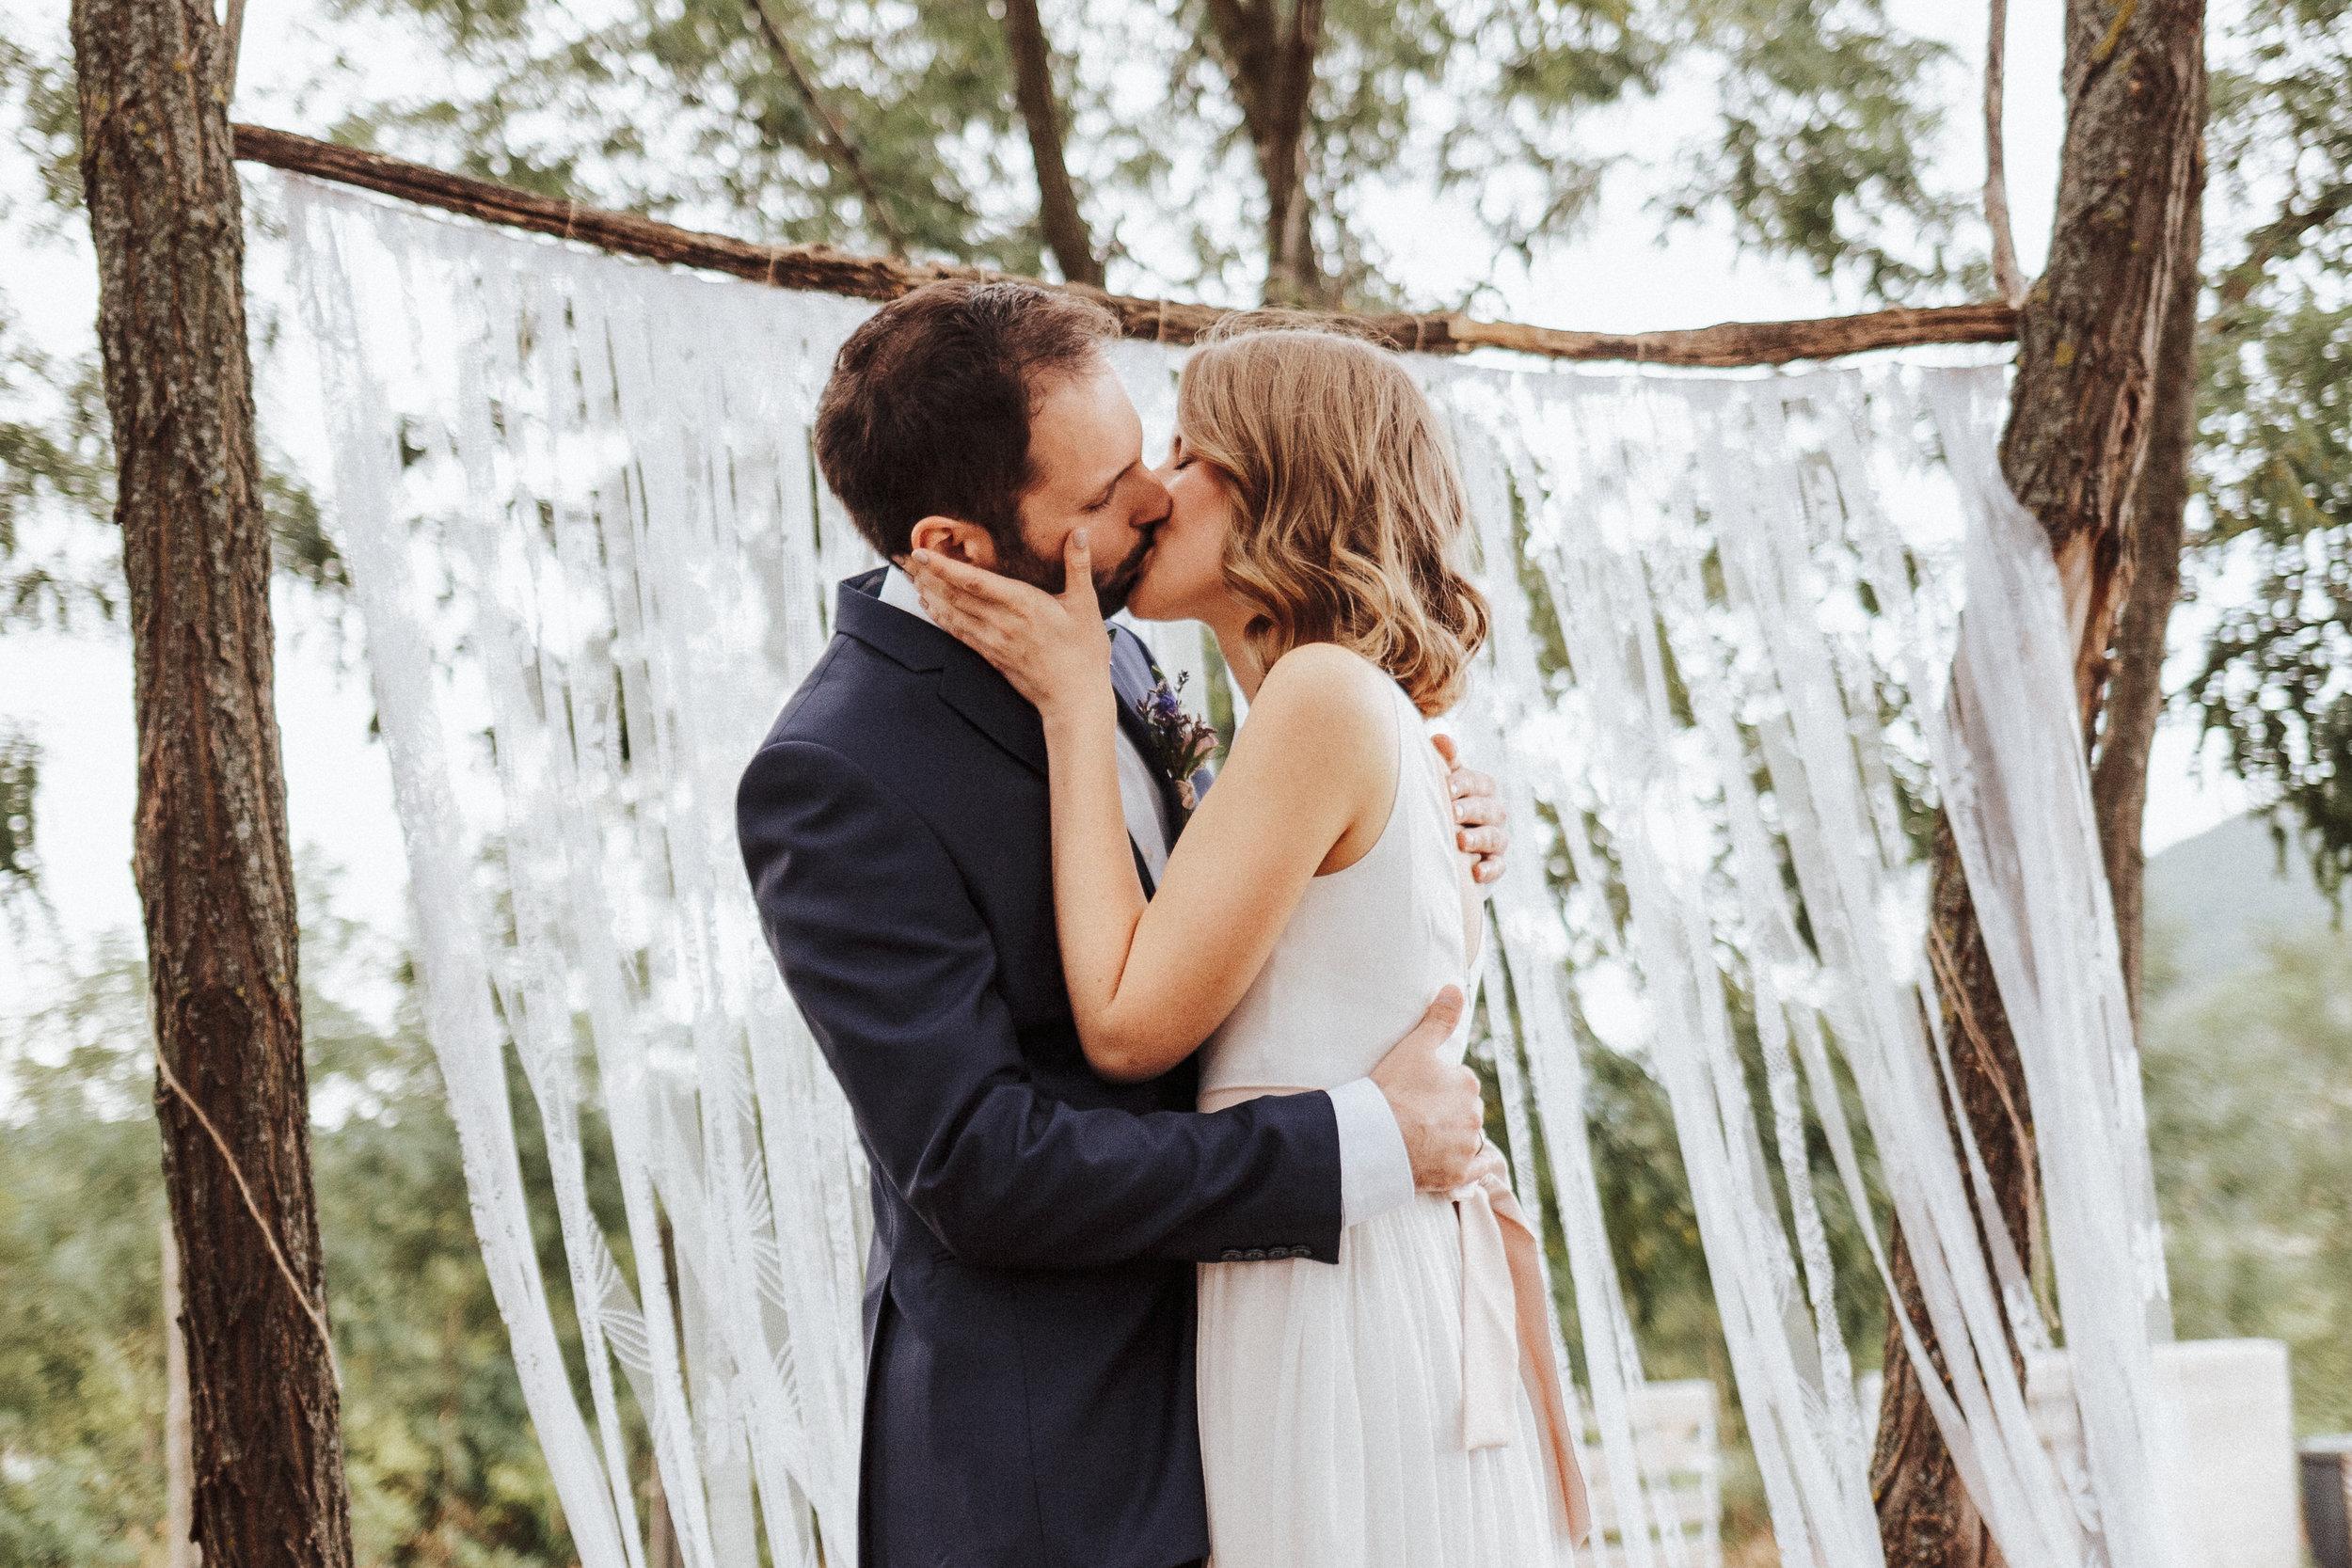 20170902_Monika+Marci_wedding_f_398__MG_5777_1.jpg